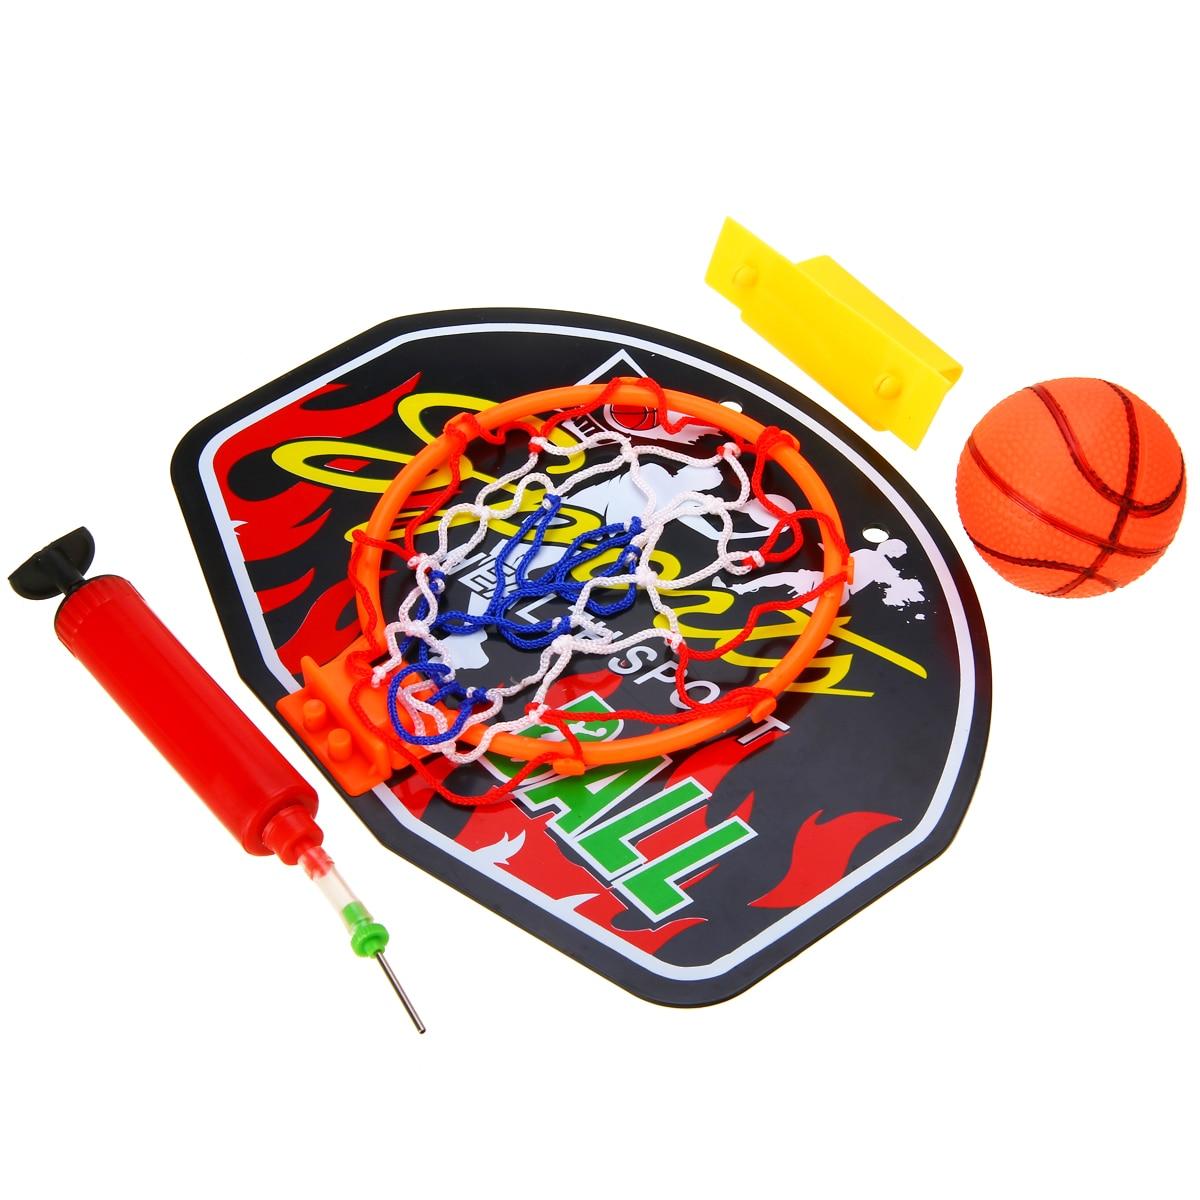 Indoor Plastic Mini Basketball Backboard Hoop Net Set With Basket Ball For Kids Child Game Portable Basketball Backboard Hot